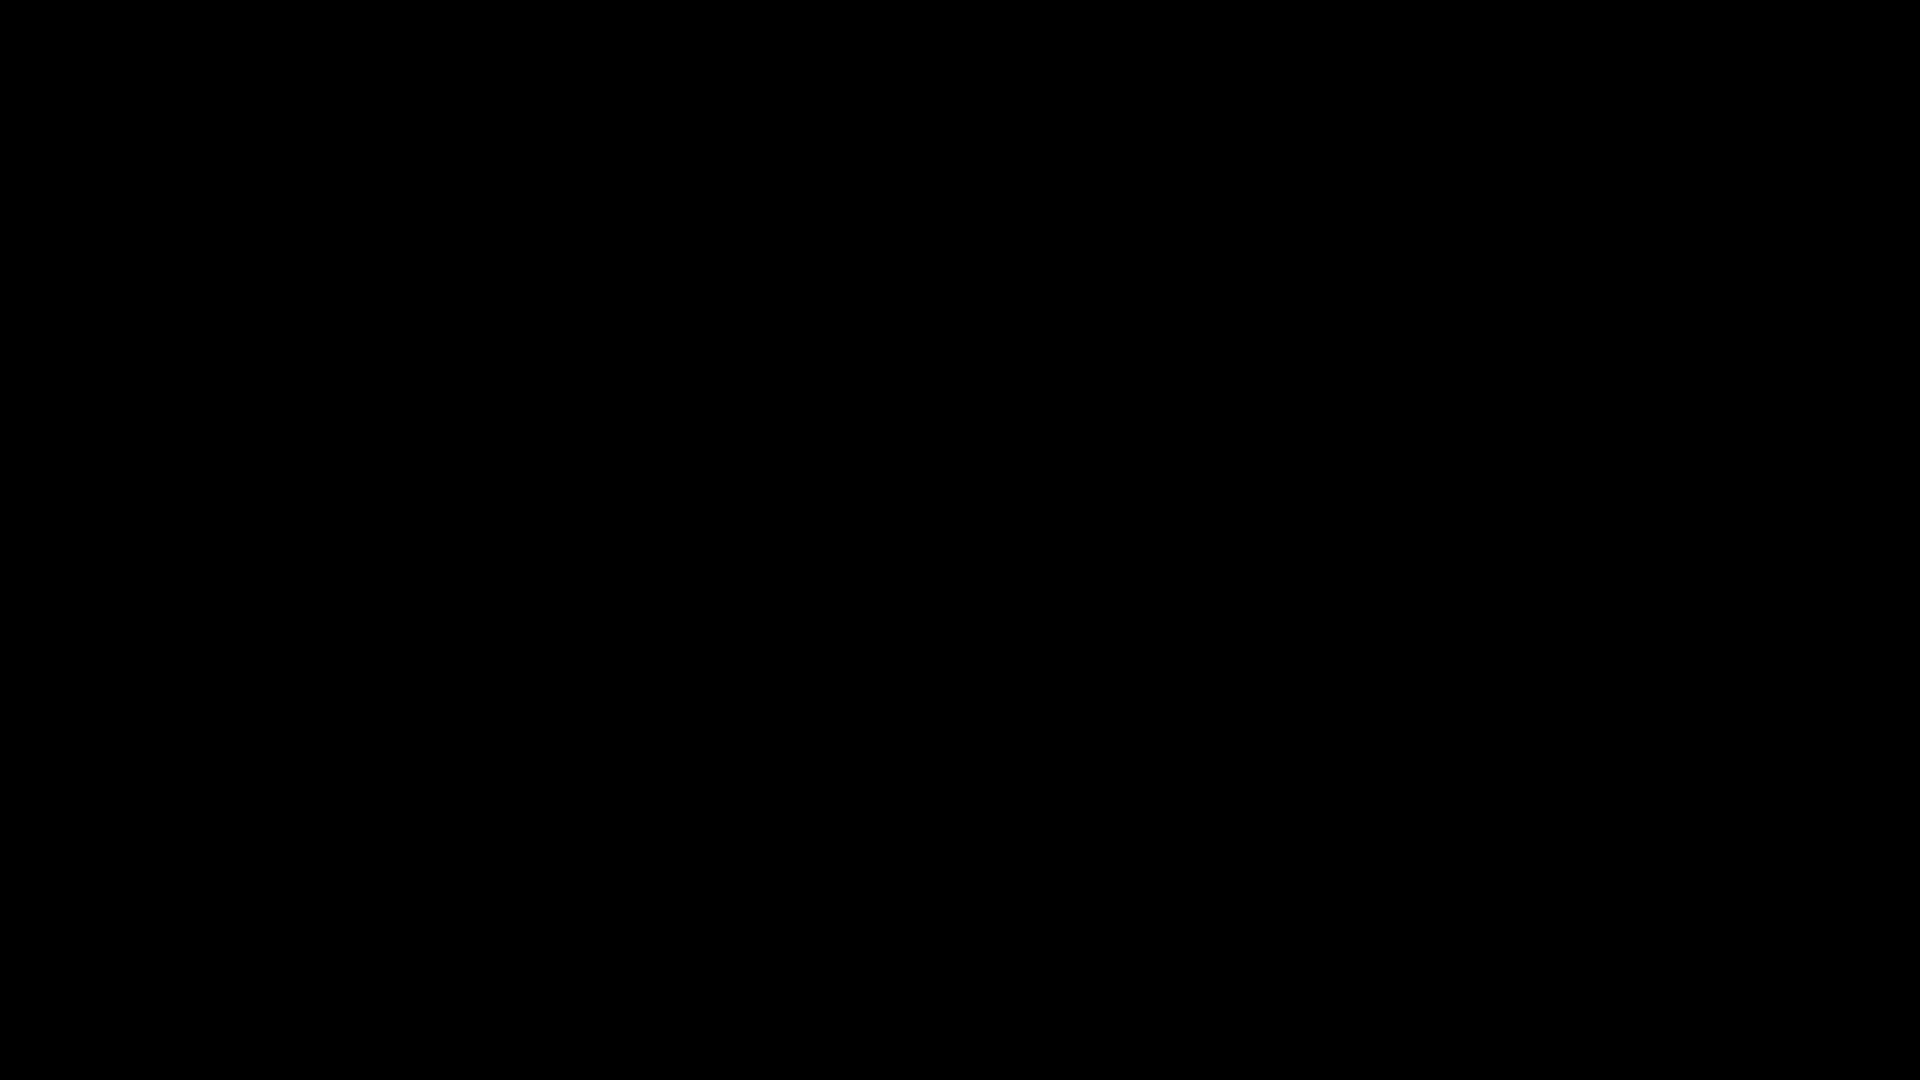 上級者の方専用 vol.06 盗撮シリーズ  93PIX 10